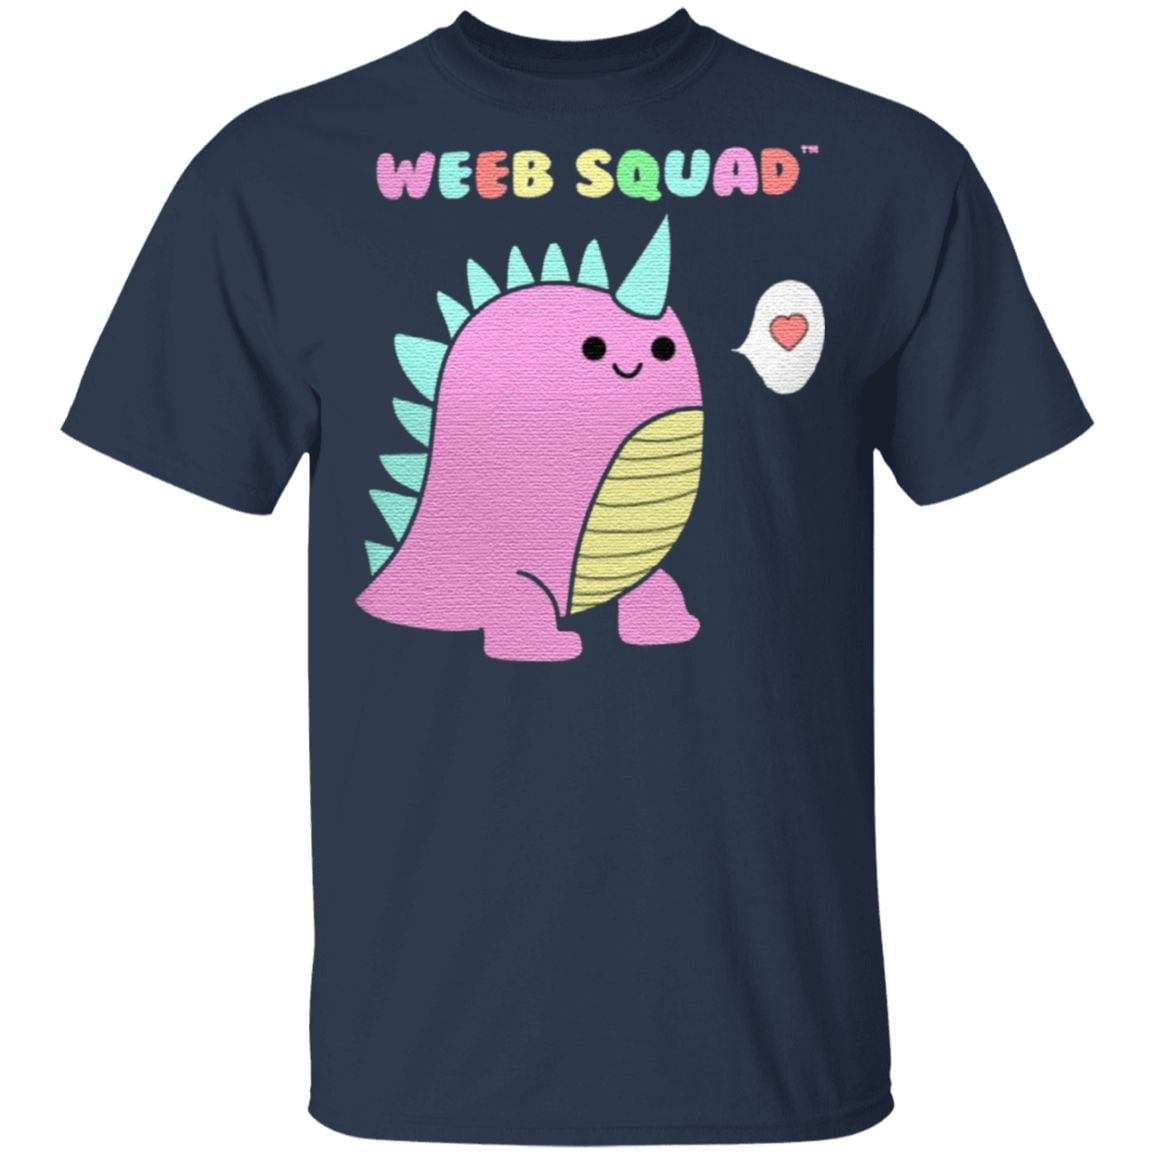 Dino Weeb Squad dinosaur weeaboo kawaii T Shirt